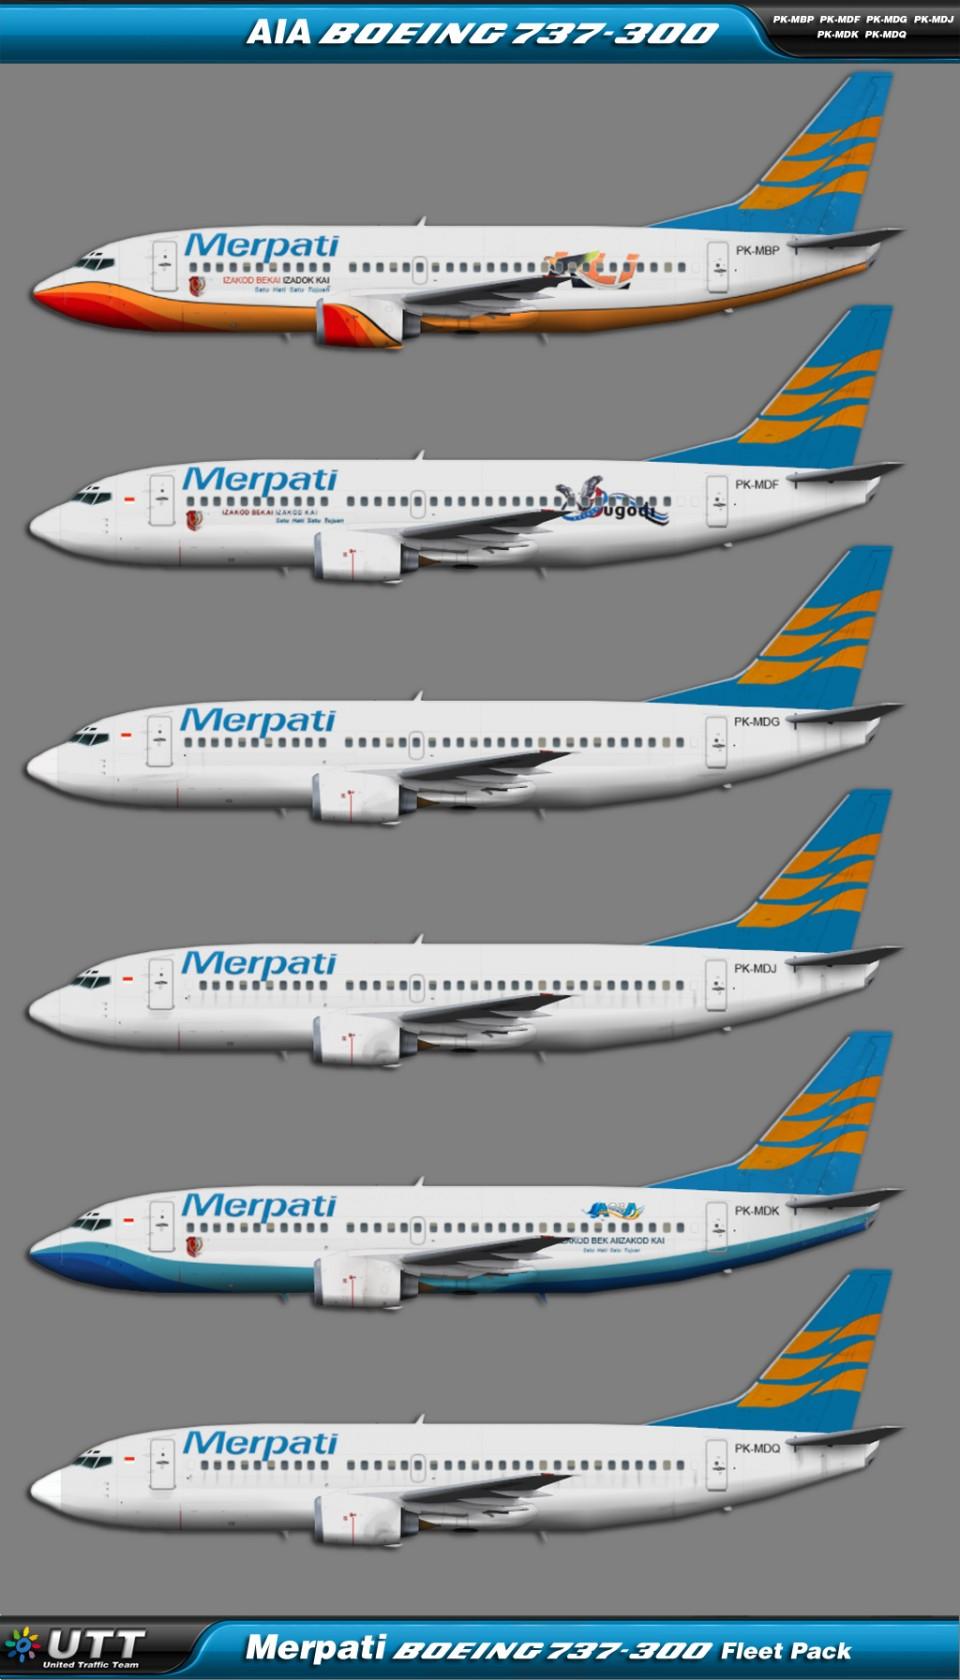 Merpati Boeing 737-300 fleet